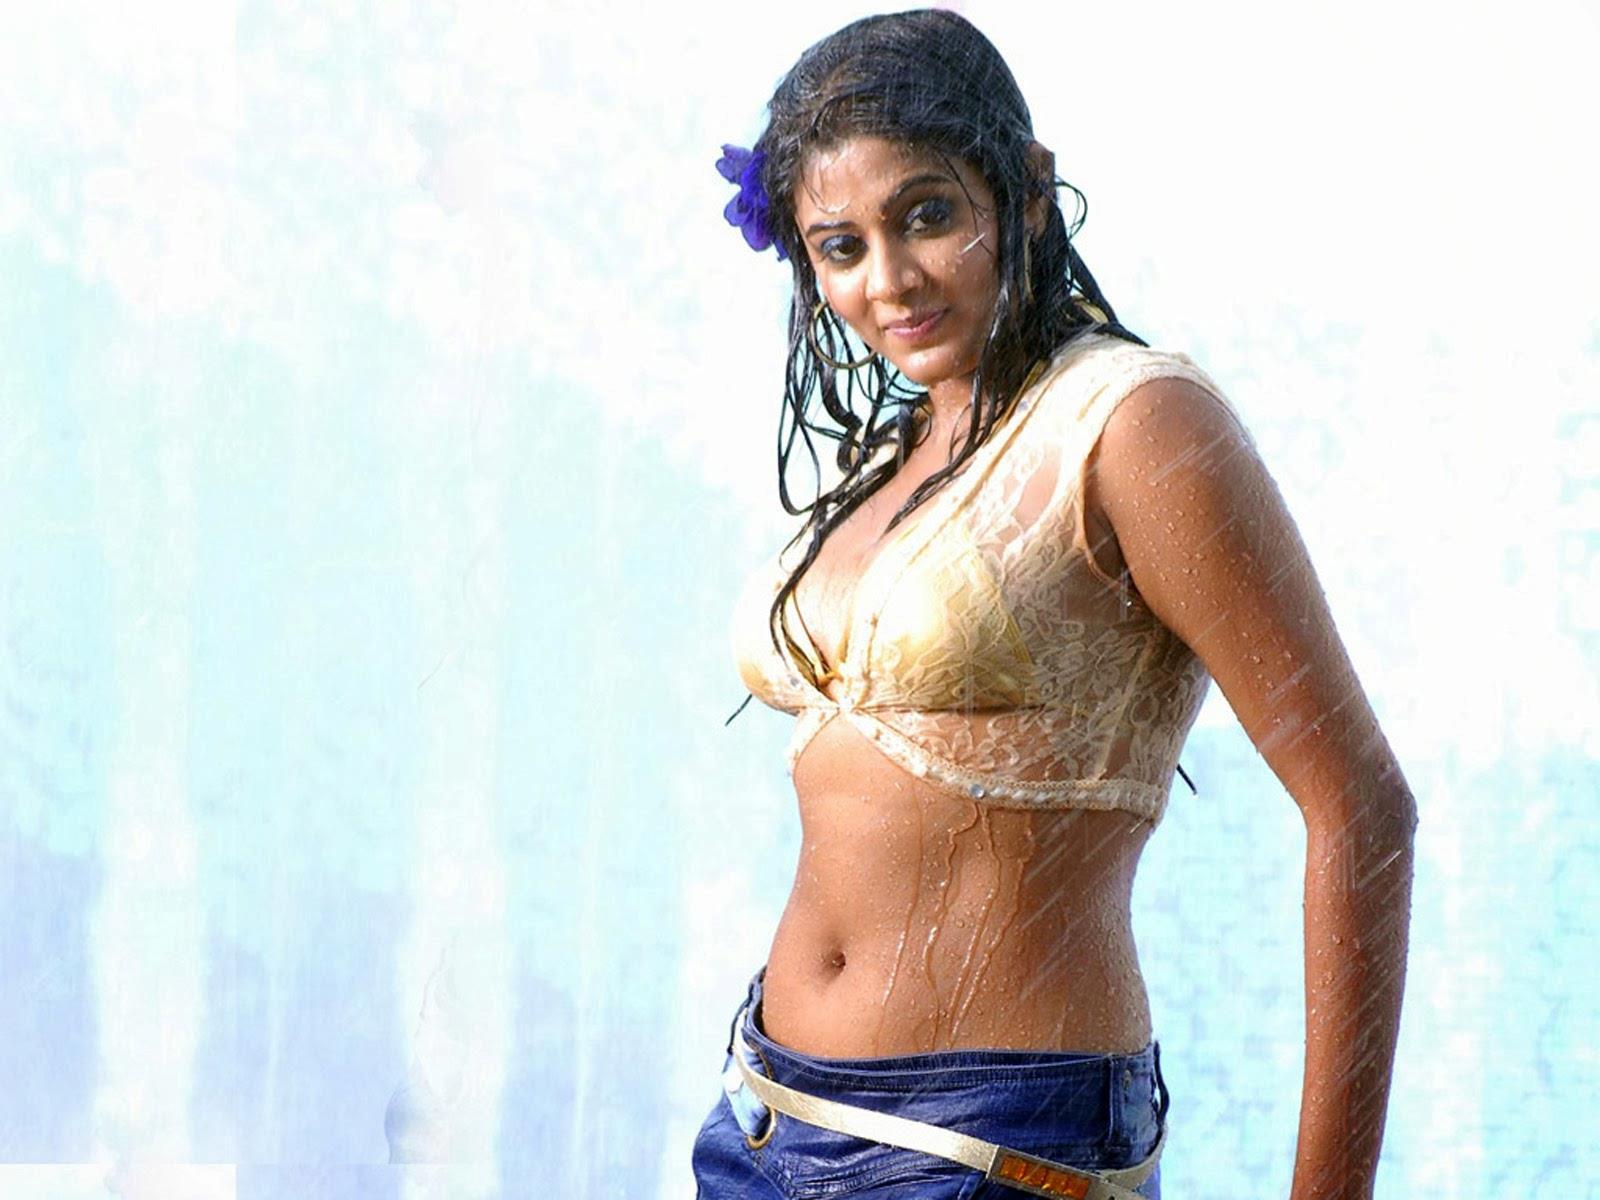 Priyamani Hot Pics of best South Indian Actress